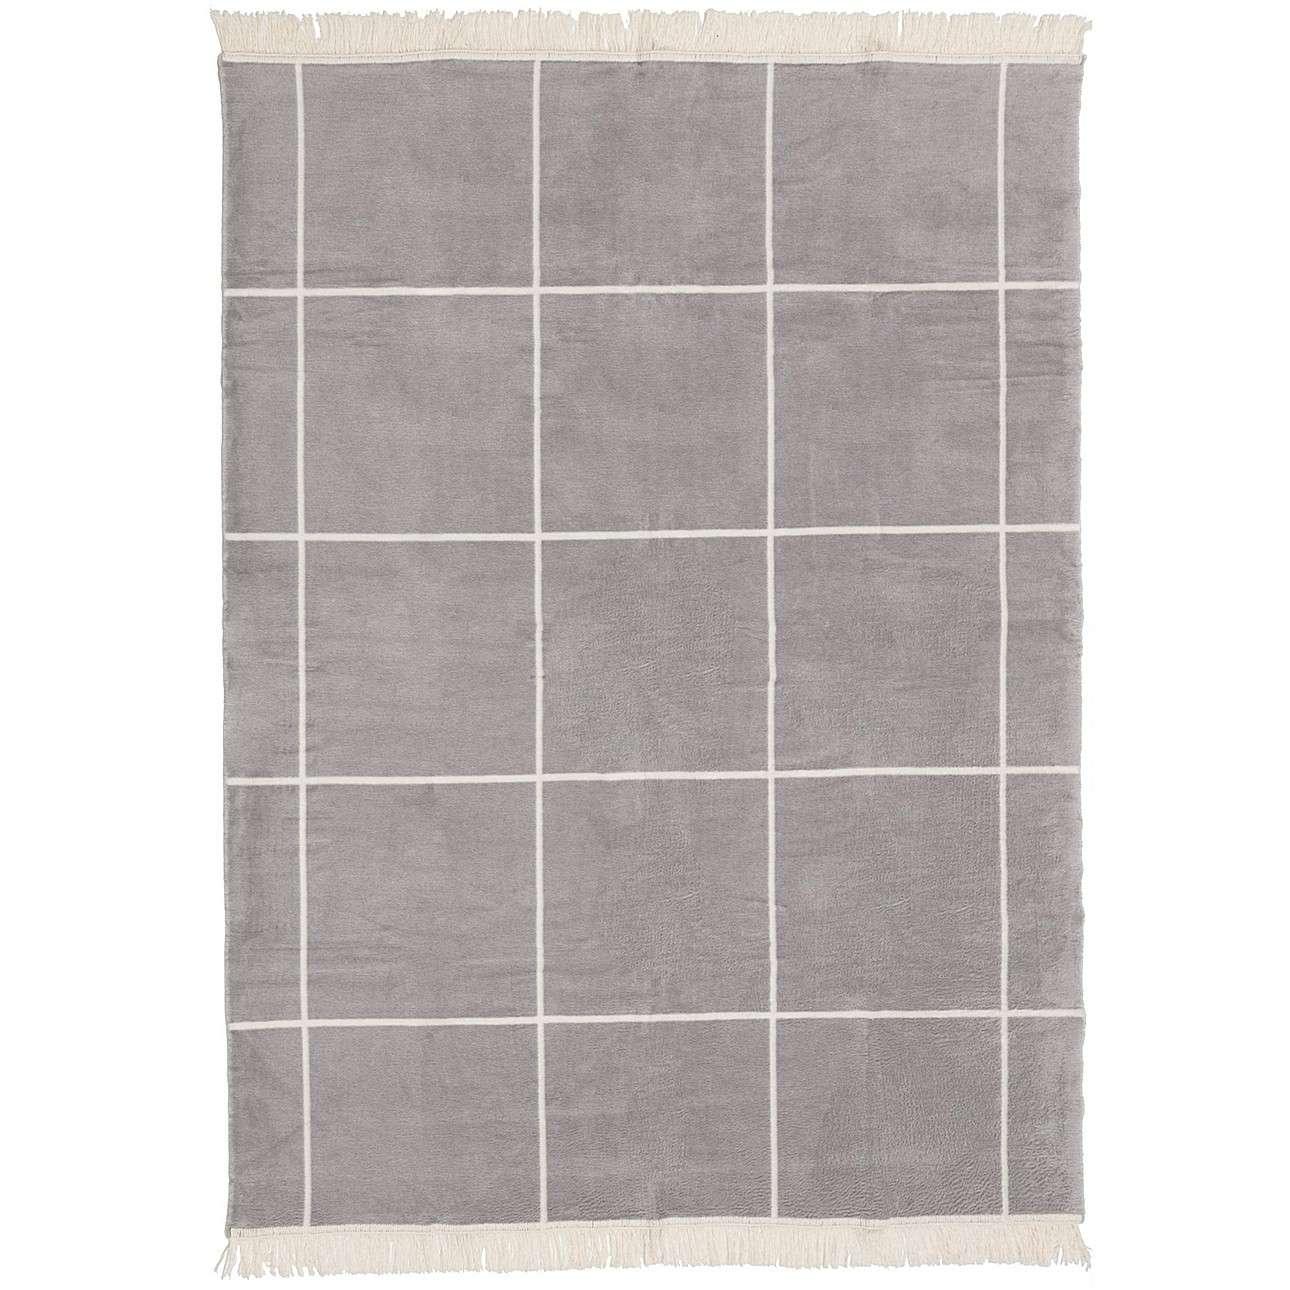 Deka Cotton Cloud 150x200 cm šedá - ecru